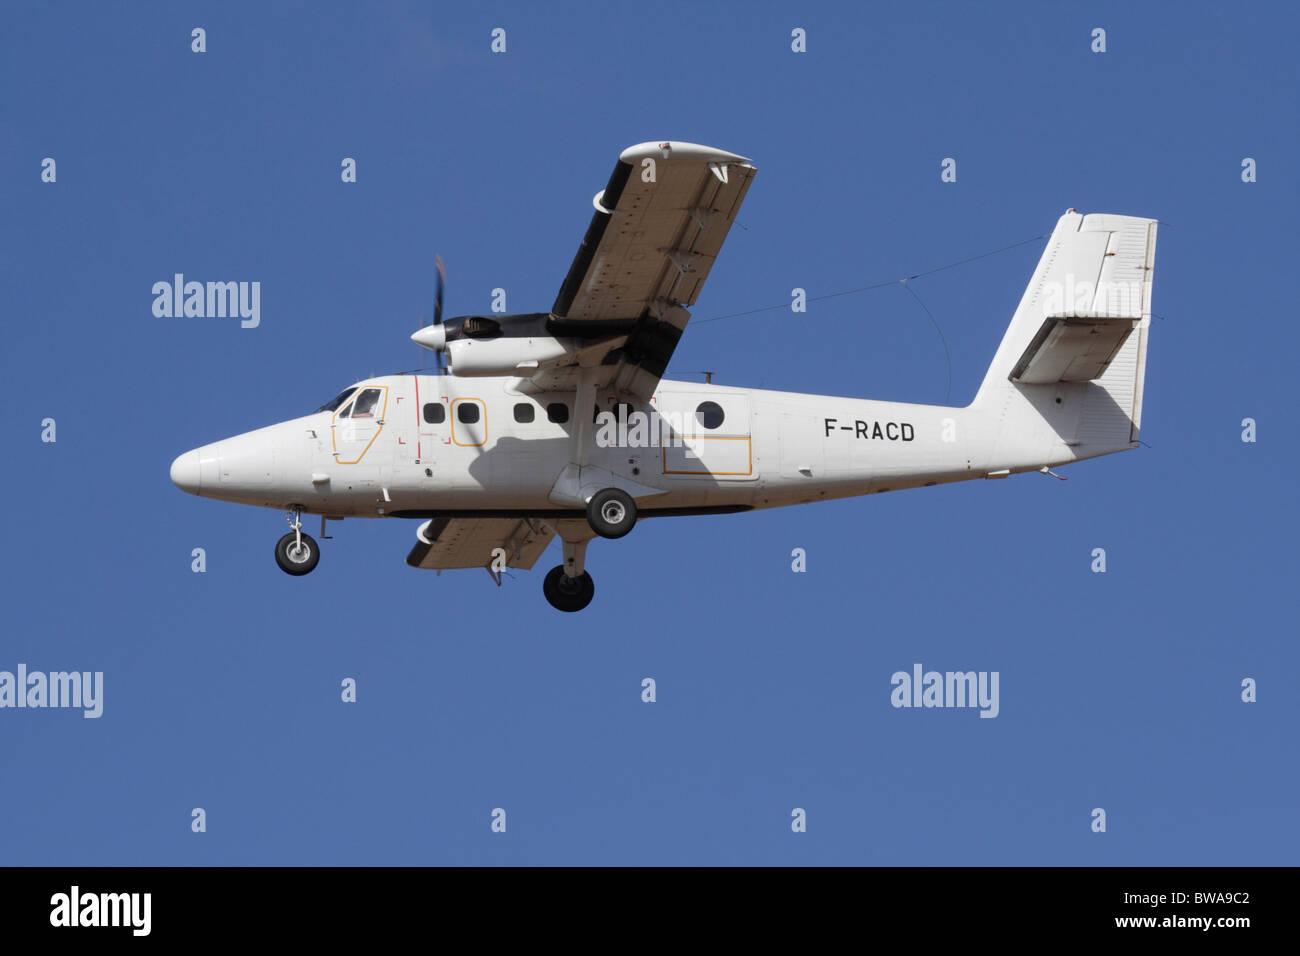 De Havilland Canada DHC-6 Twin Otter light turboprop commuter plane in flight - Stock Image